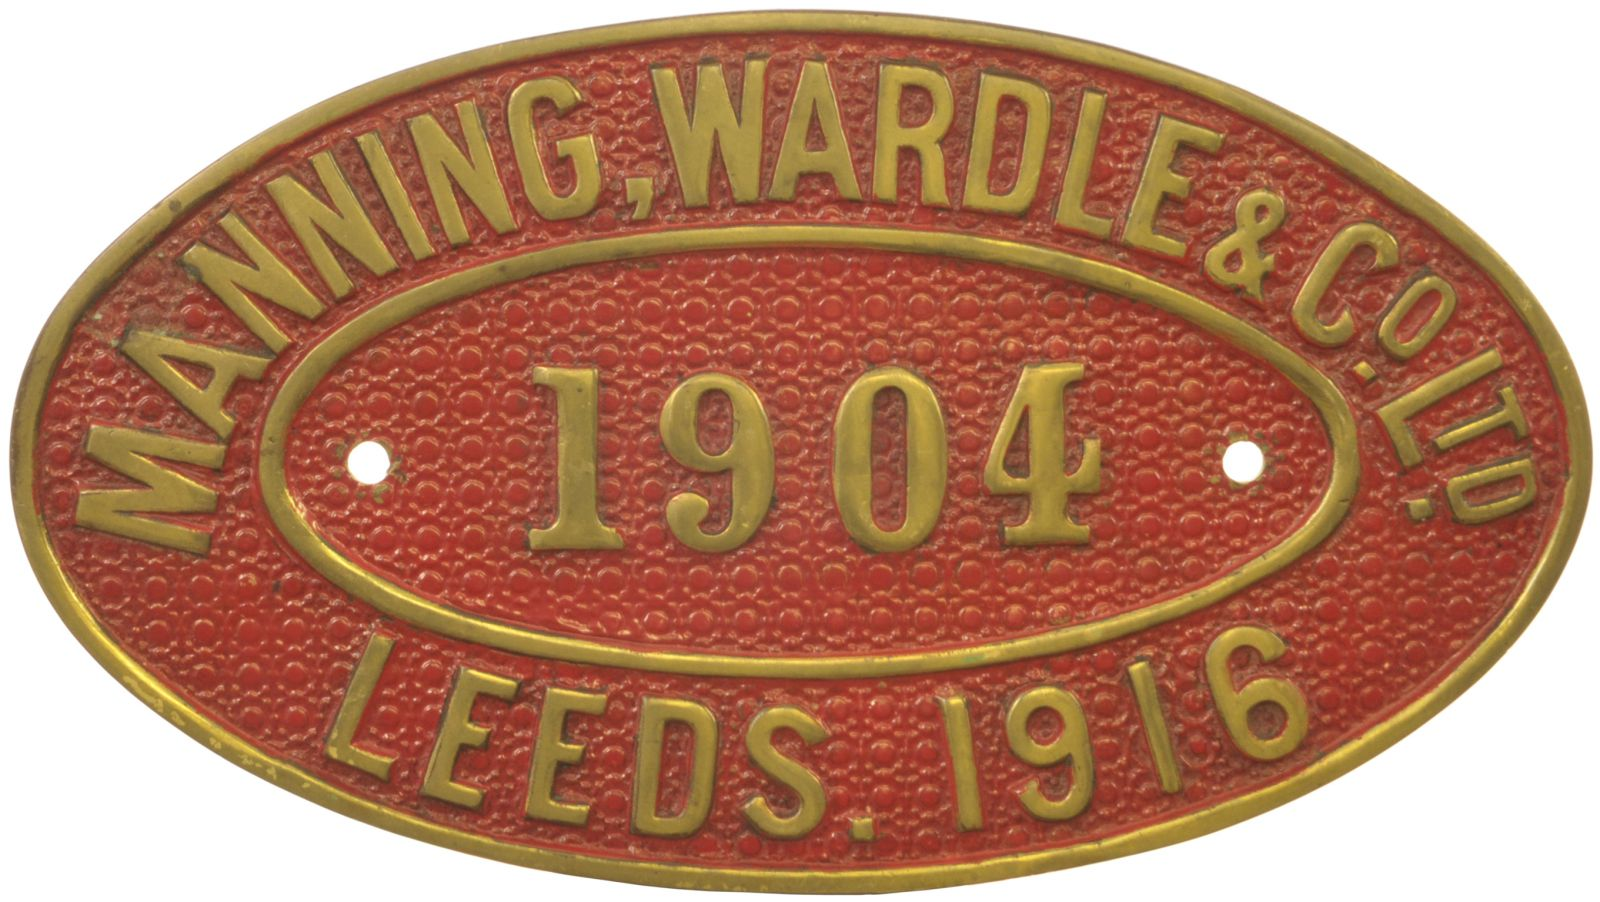 Lot 15 - Railway Locomotive Worksplates (Steam), Manning Wardle, 1904, 1916: A worksplate, MANNING WARDLE,